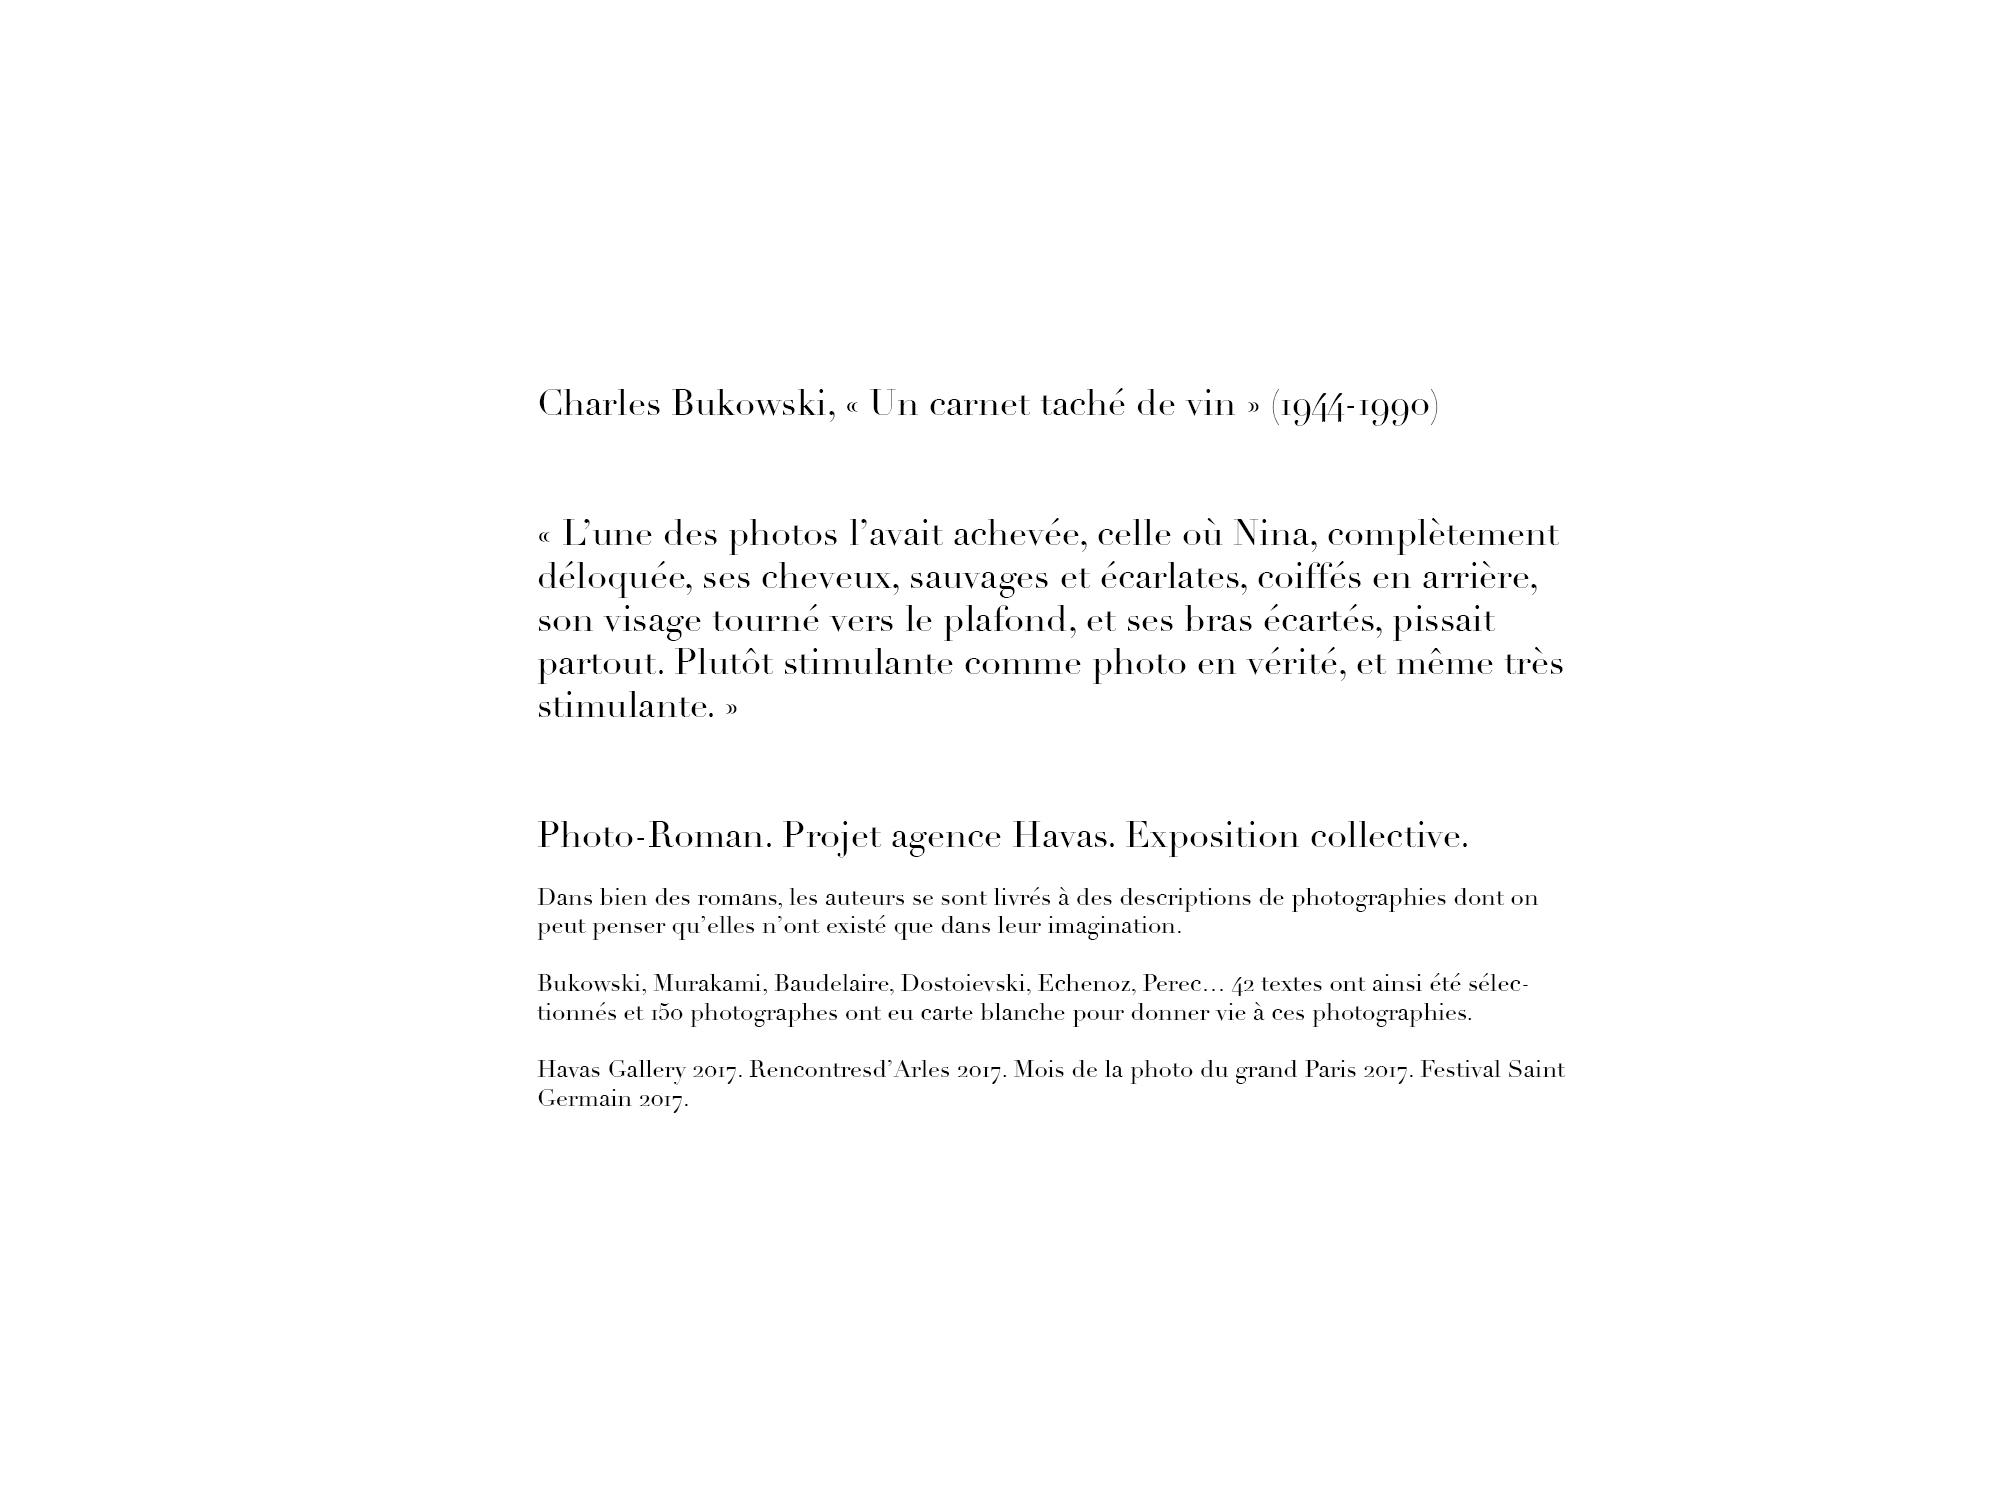 Charles Bukowski / Photo-roman